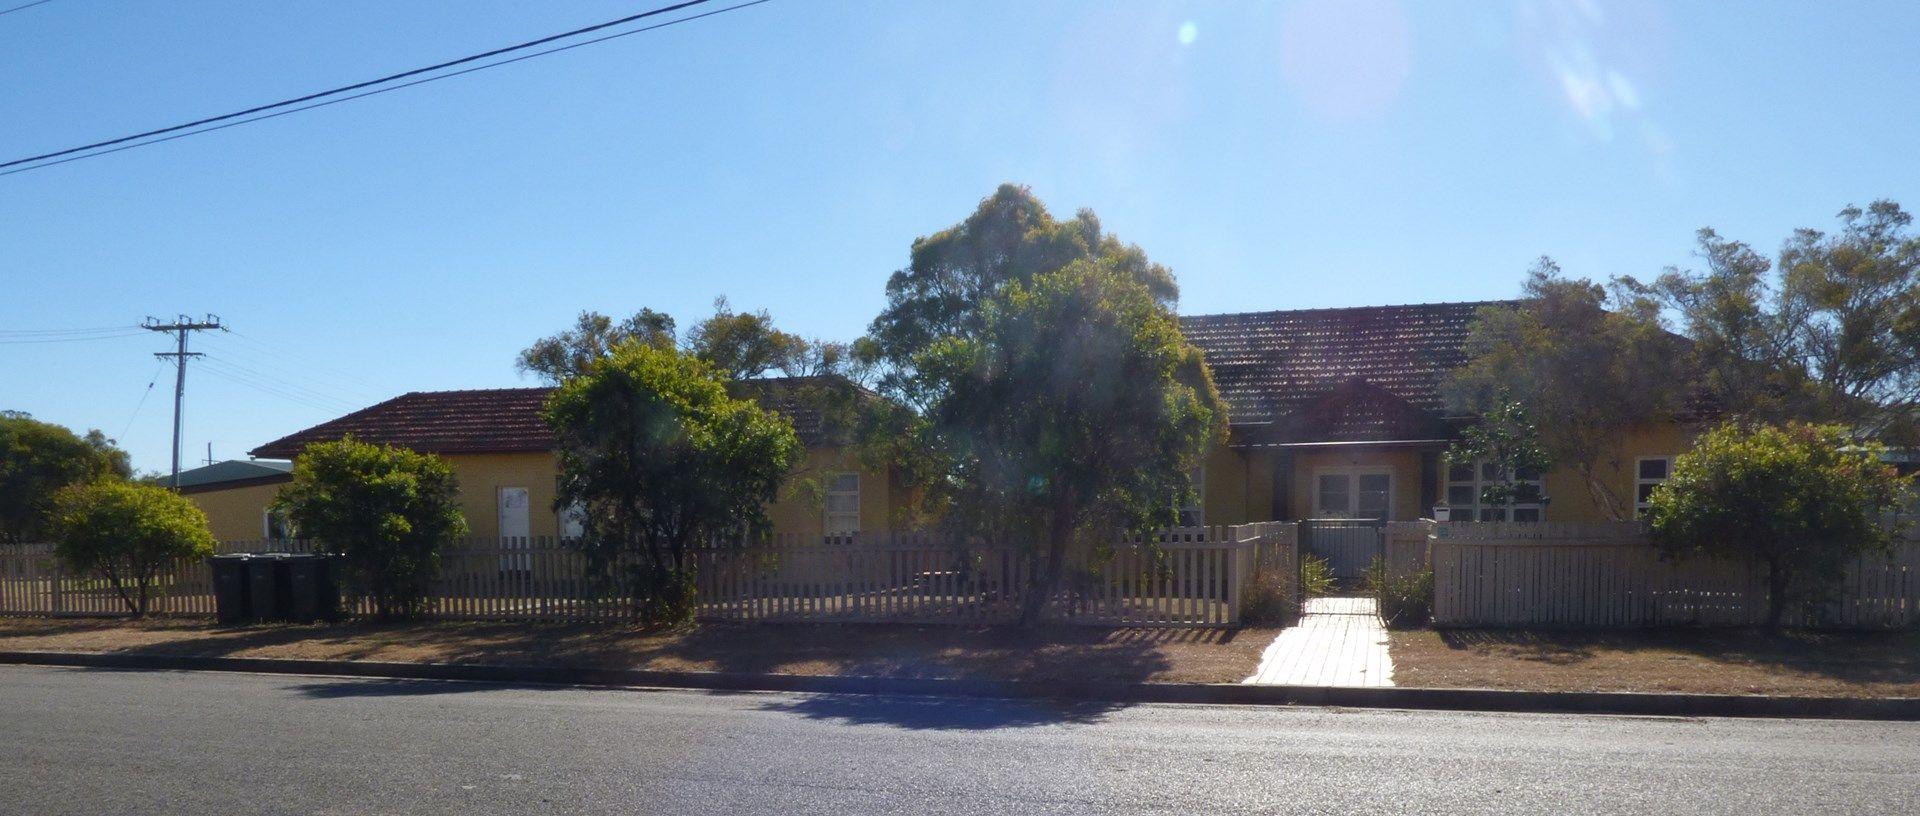 23 Macalister Street, Murgon QLD 4605, Image 0